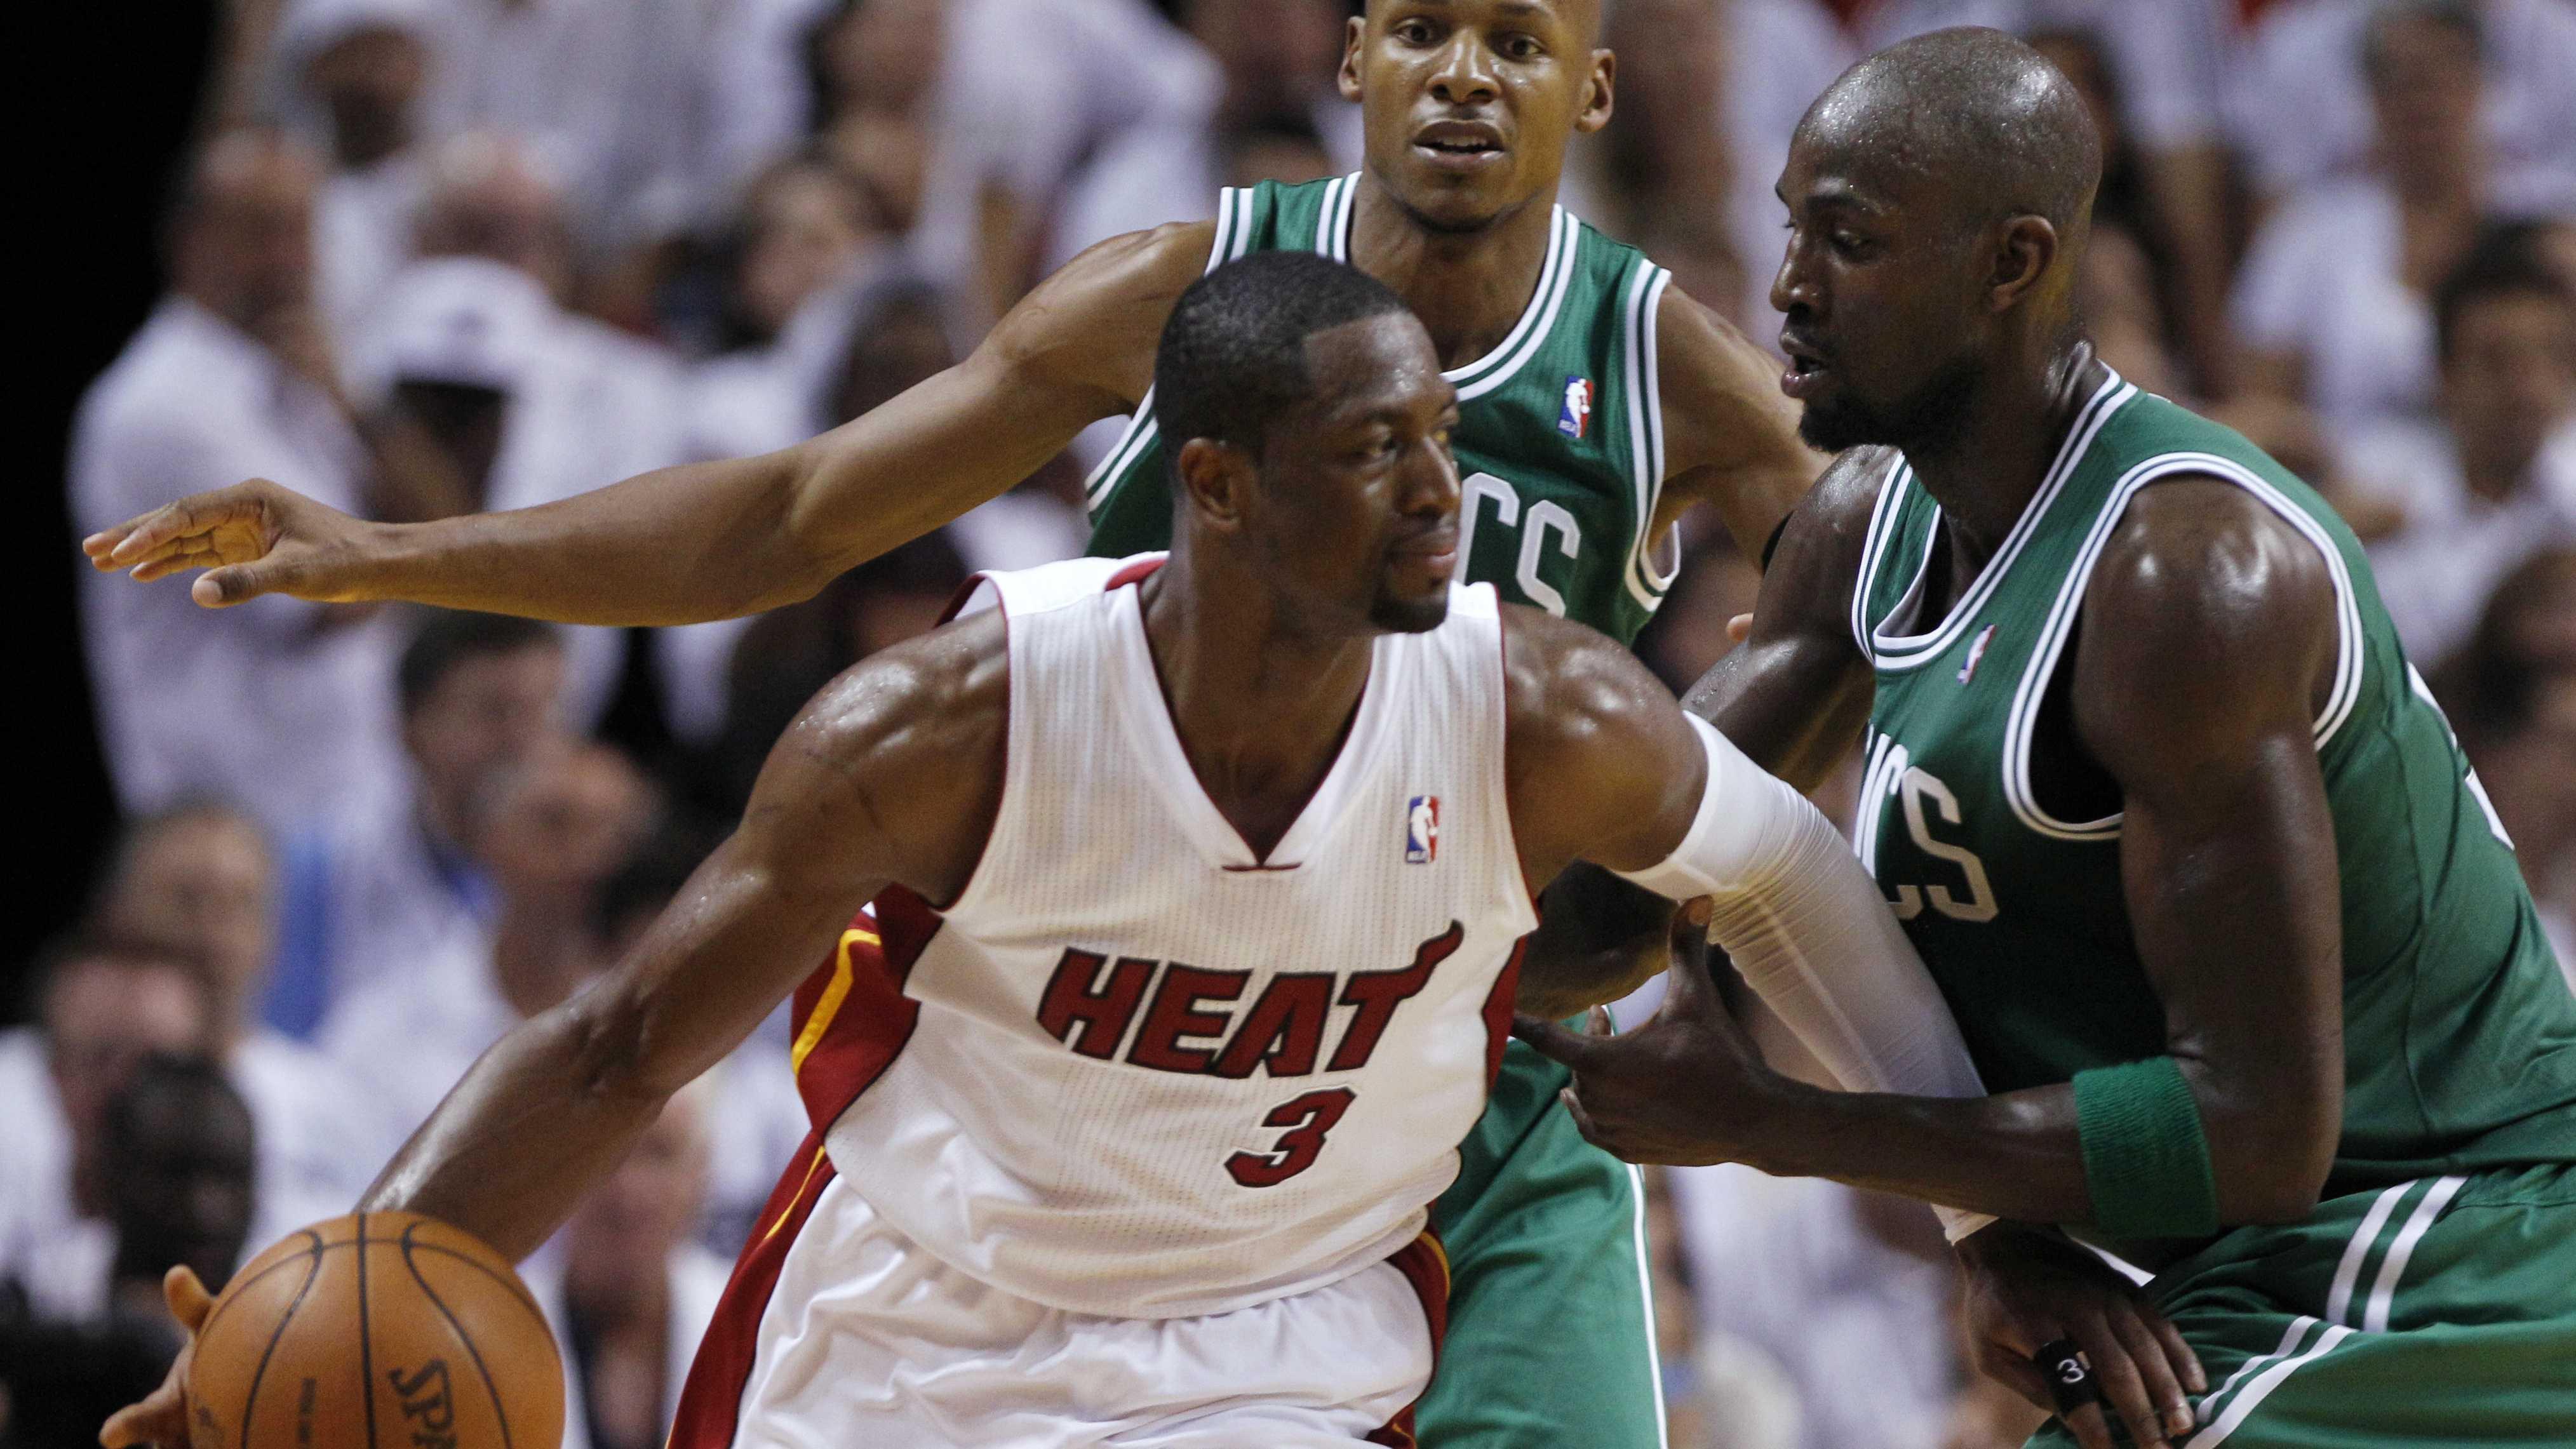 Miami Heat's Dwyane Wade dribbles as Boston Celtics' Kevin Garnett, right, defends.